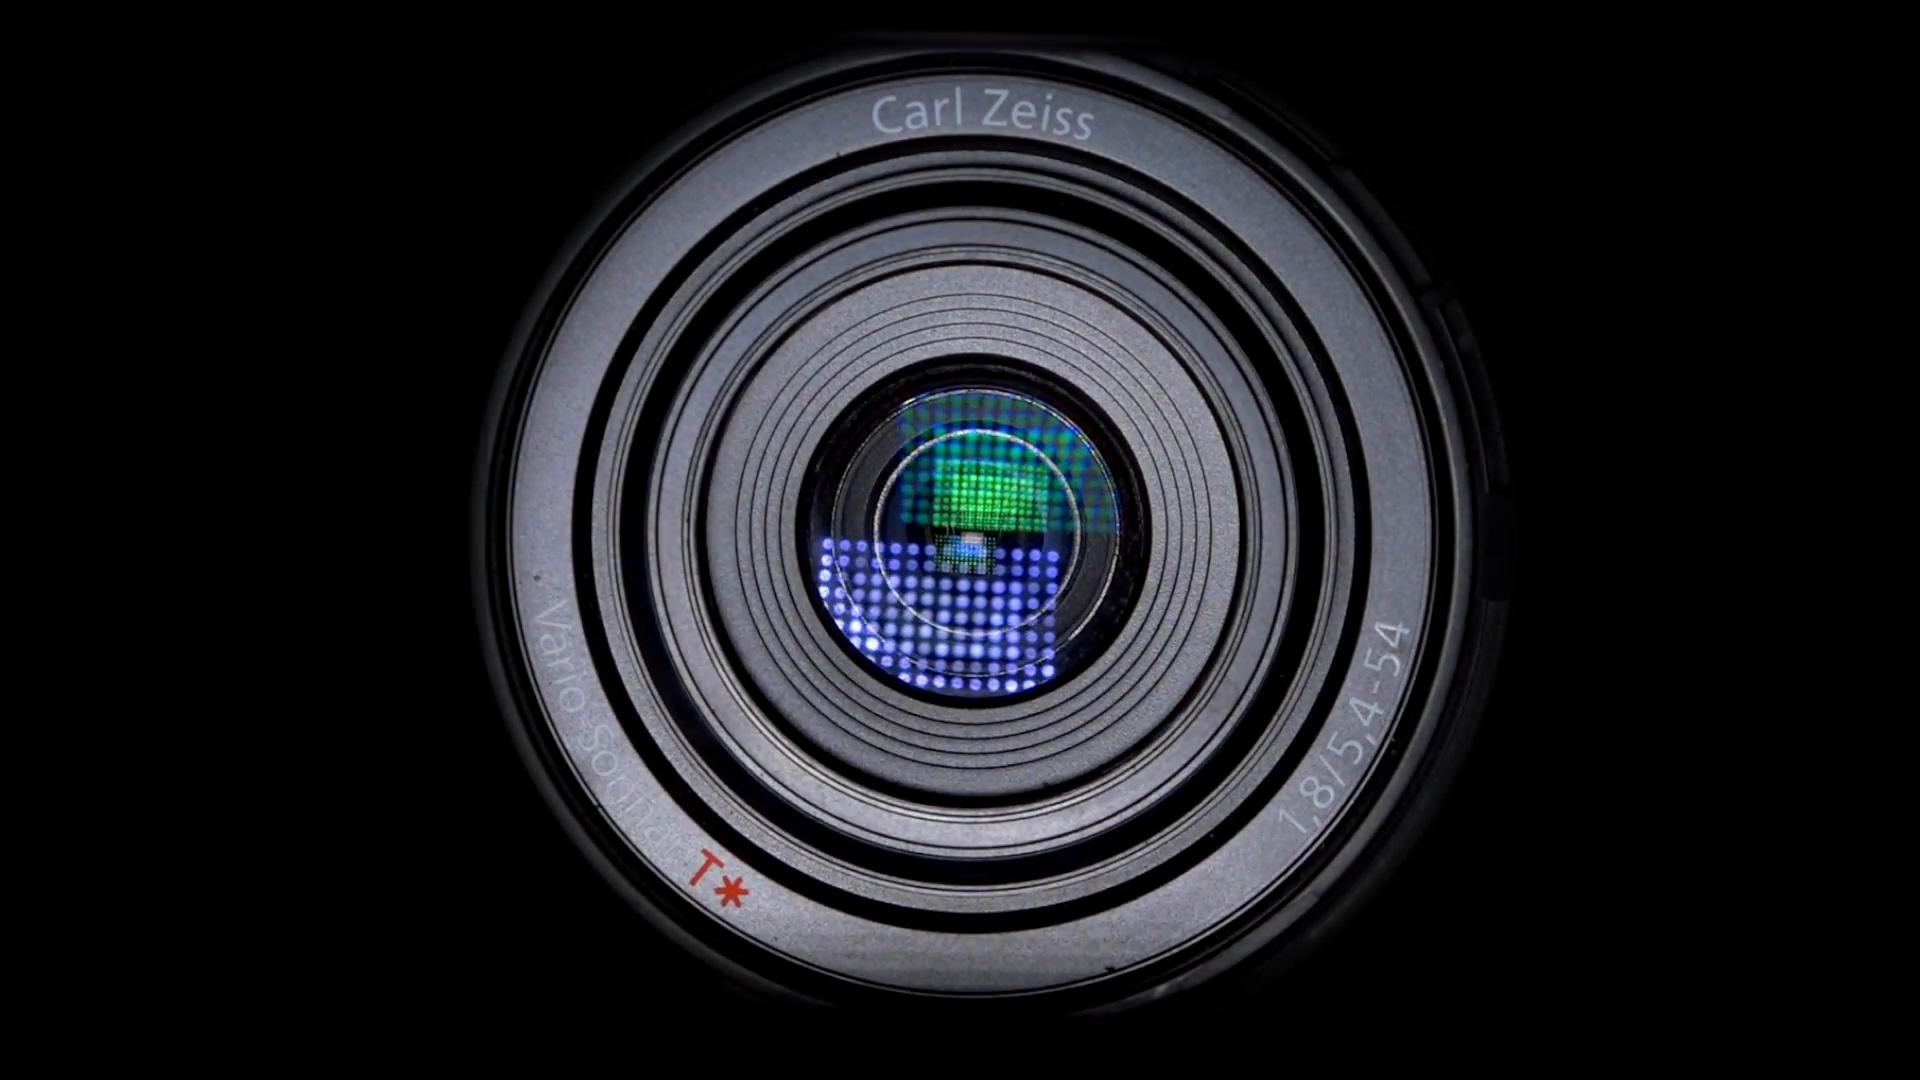 Camera lens & light reflection in lens on black background ...